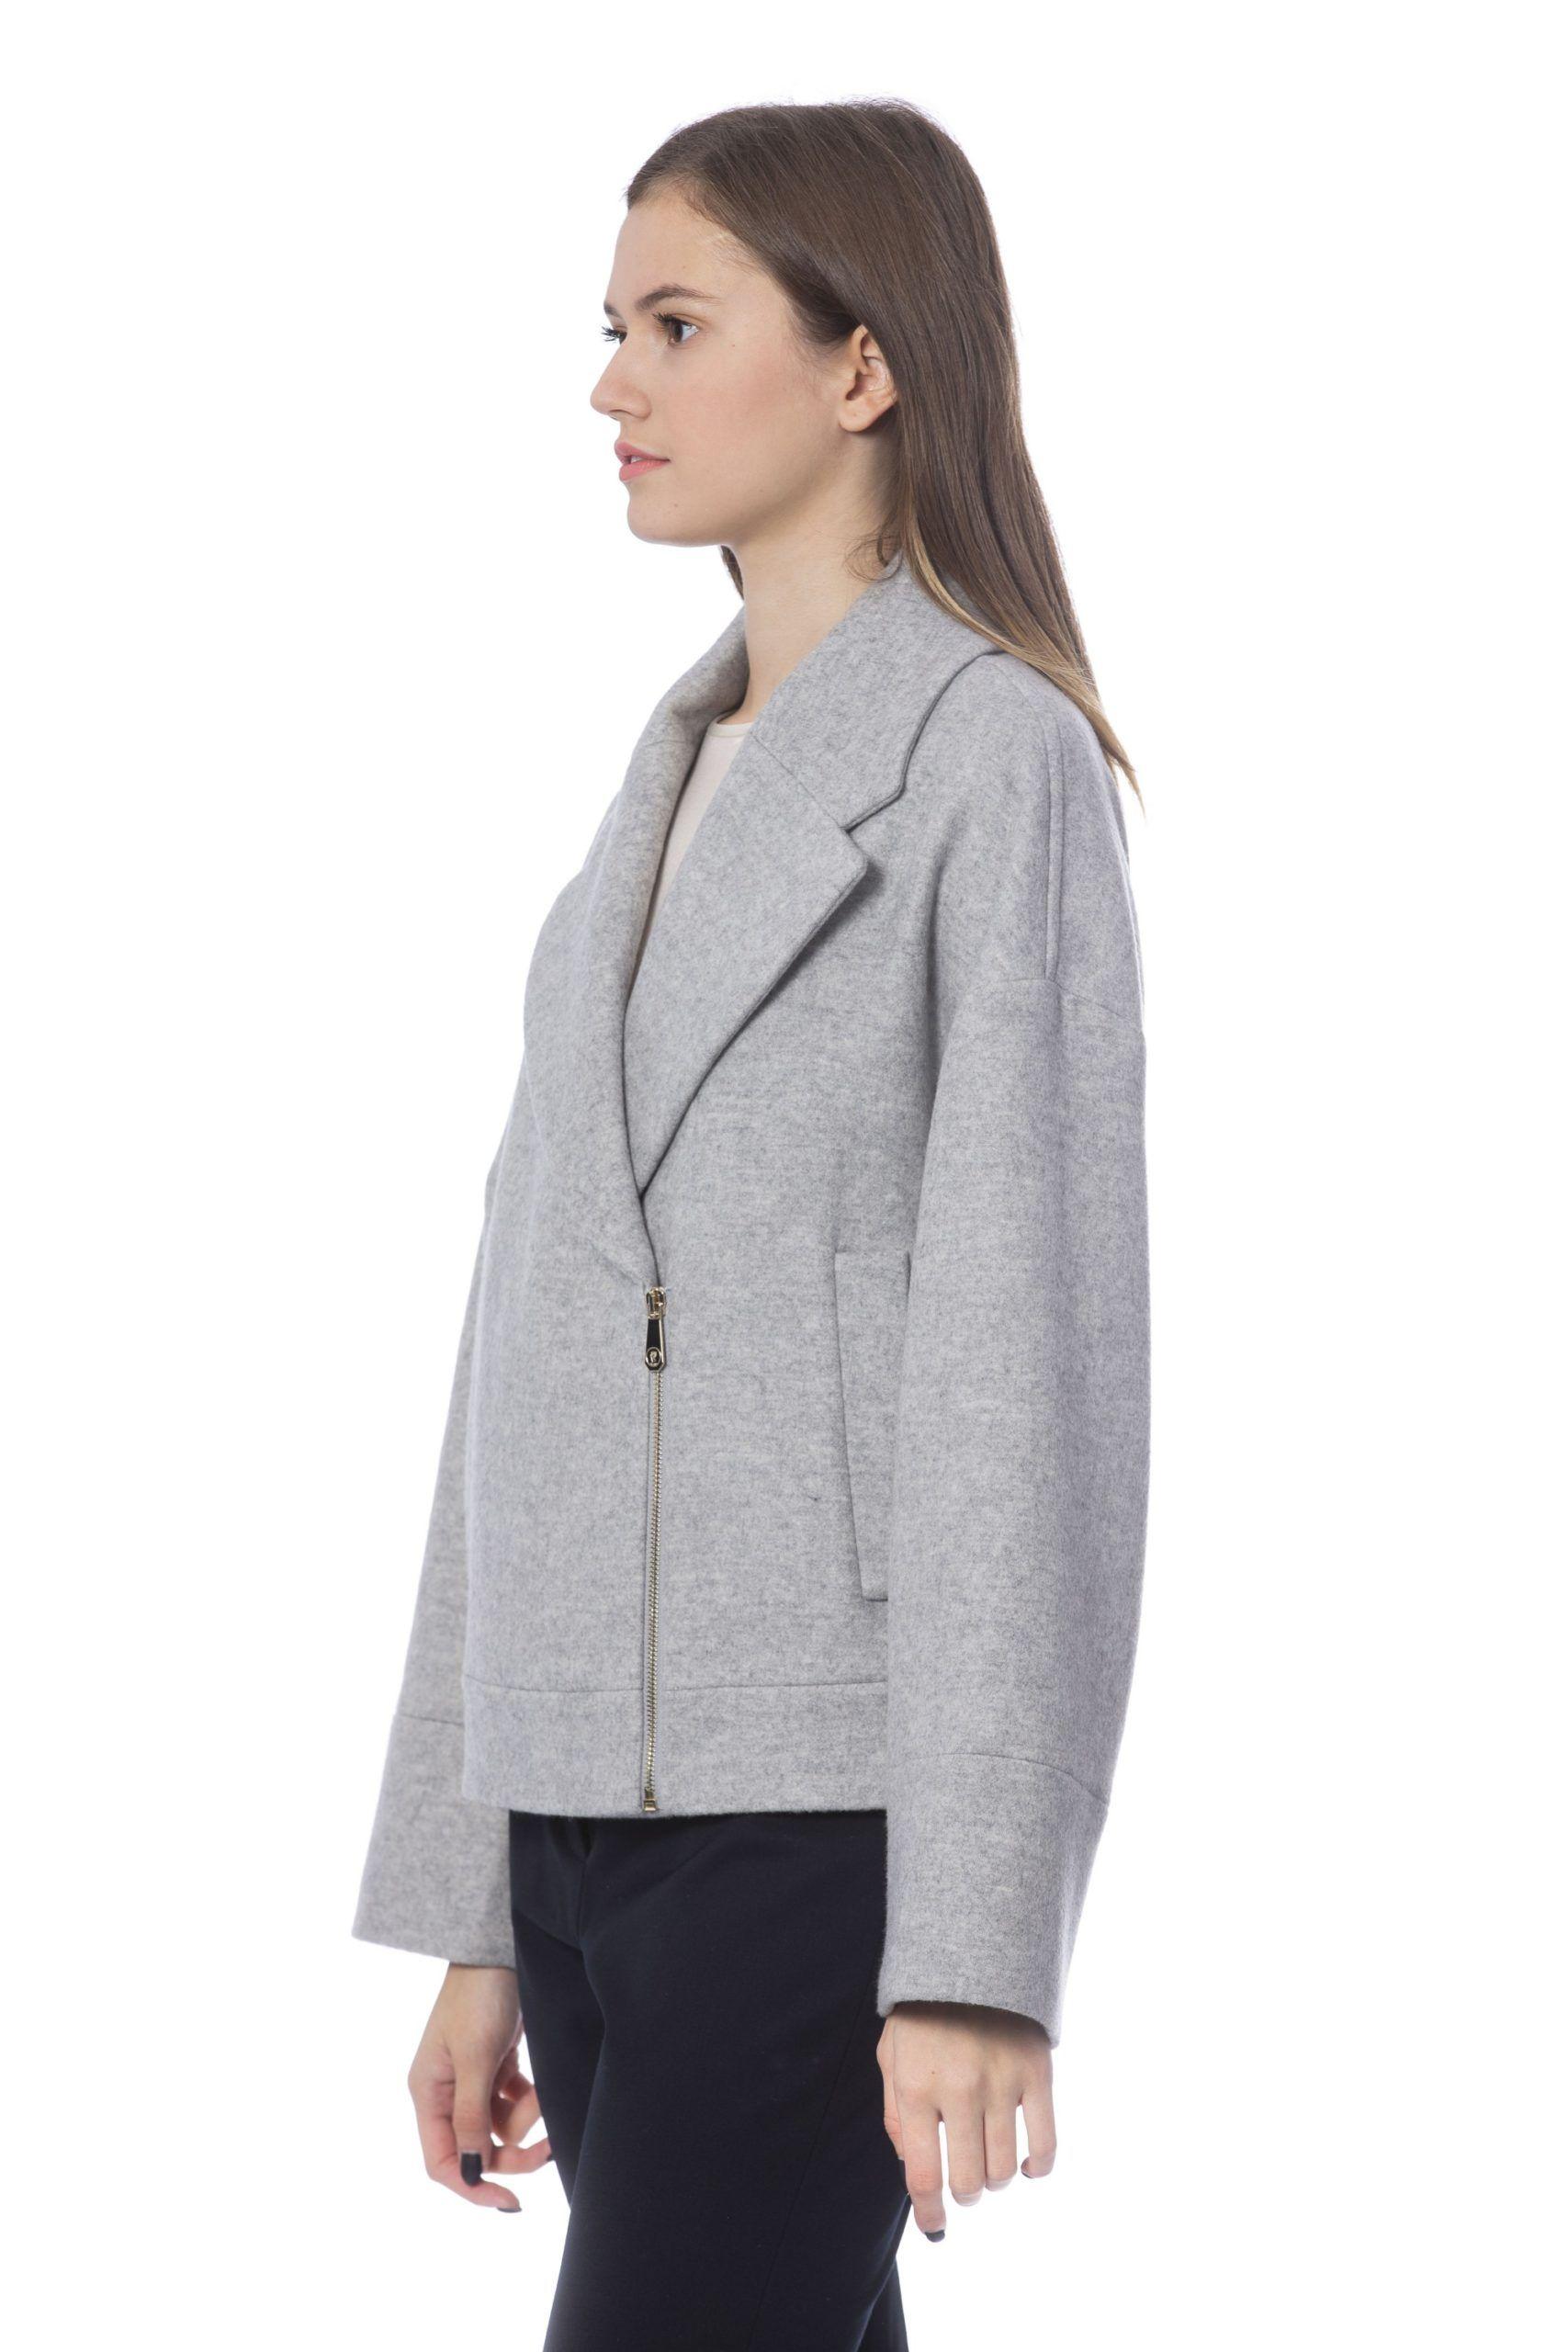 Peserico Grigio Jackets & Coat